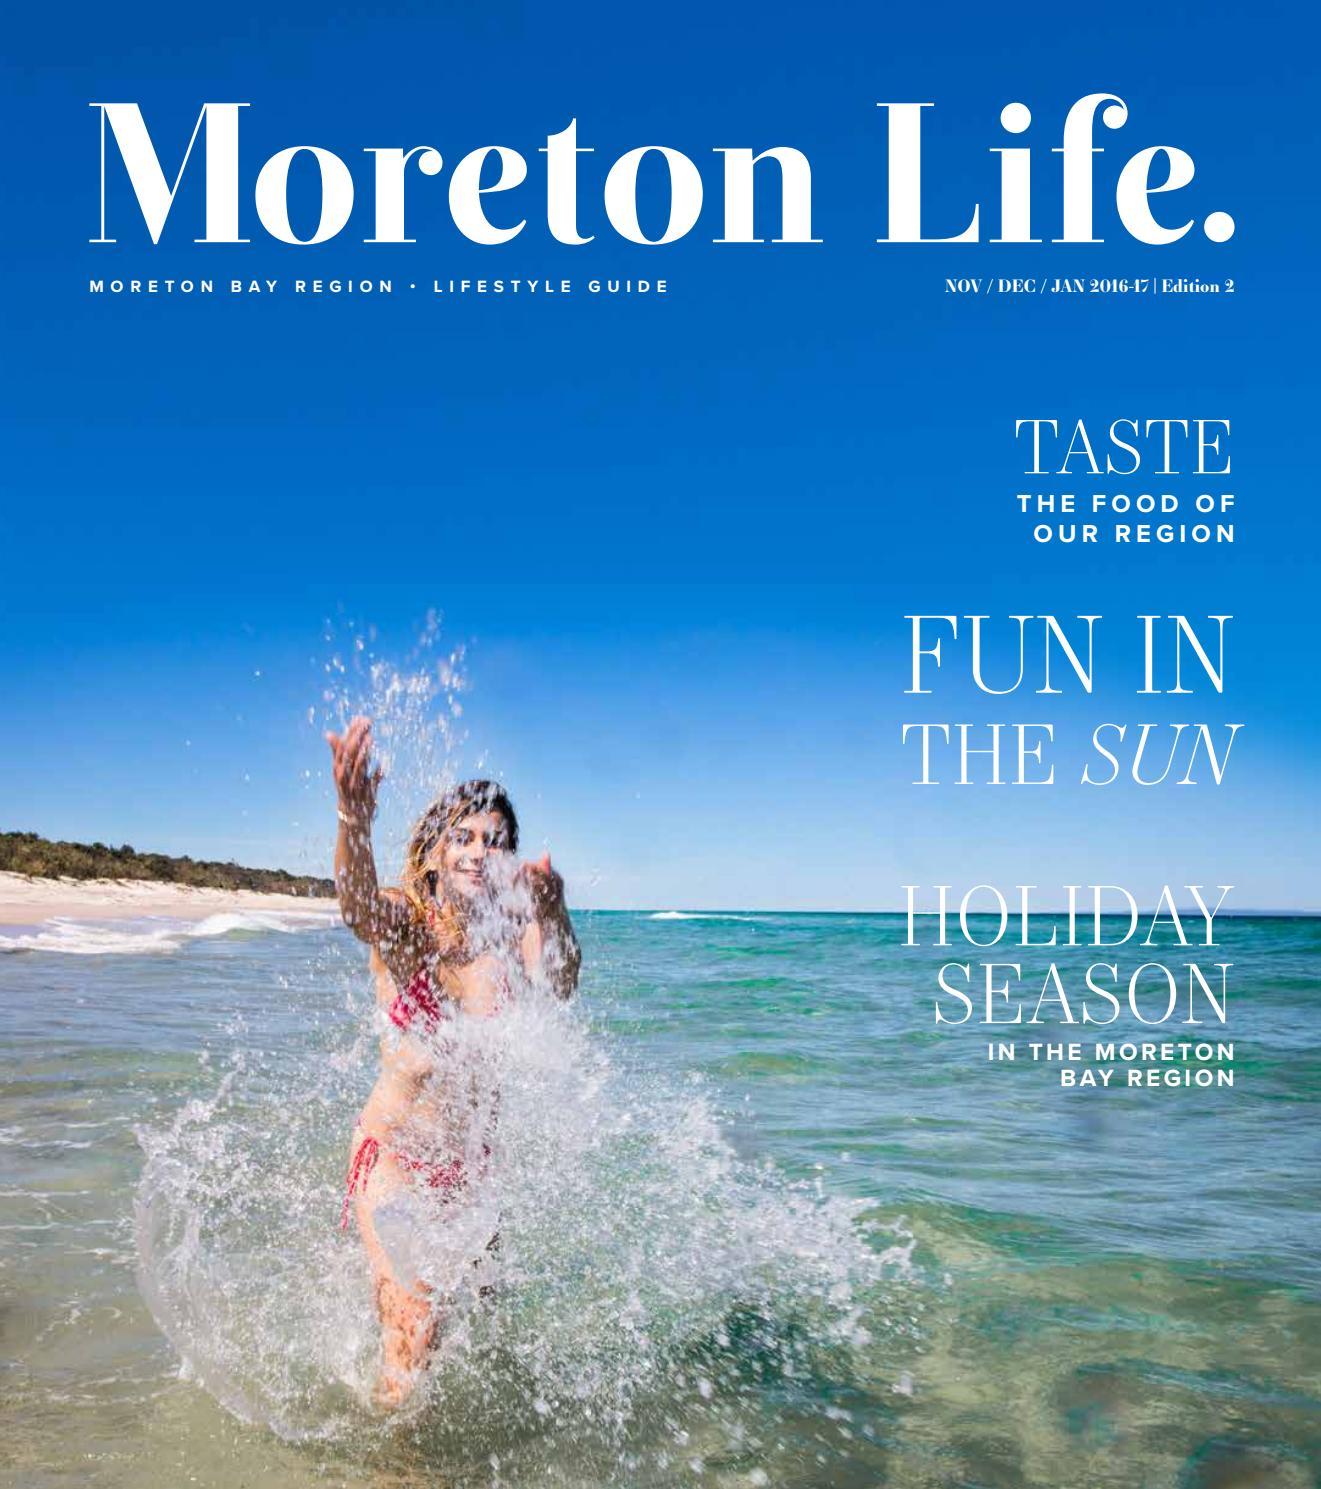 Moreton Life Issue 2 | Moreton Bay Region by Visit Moreton